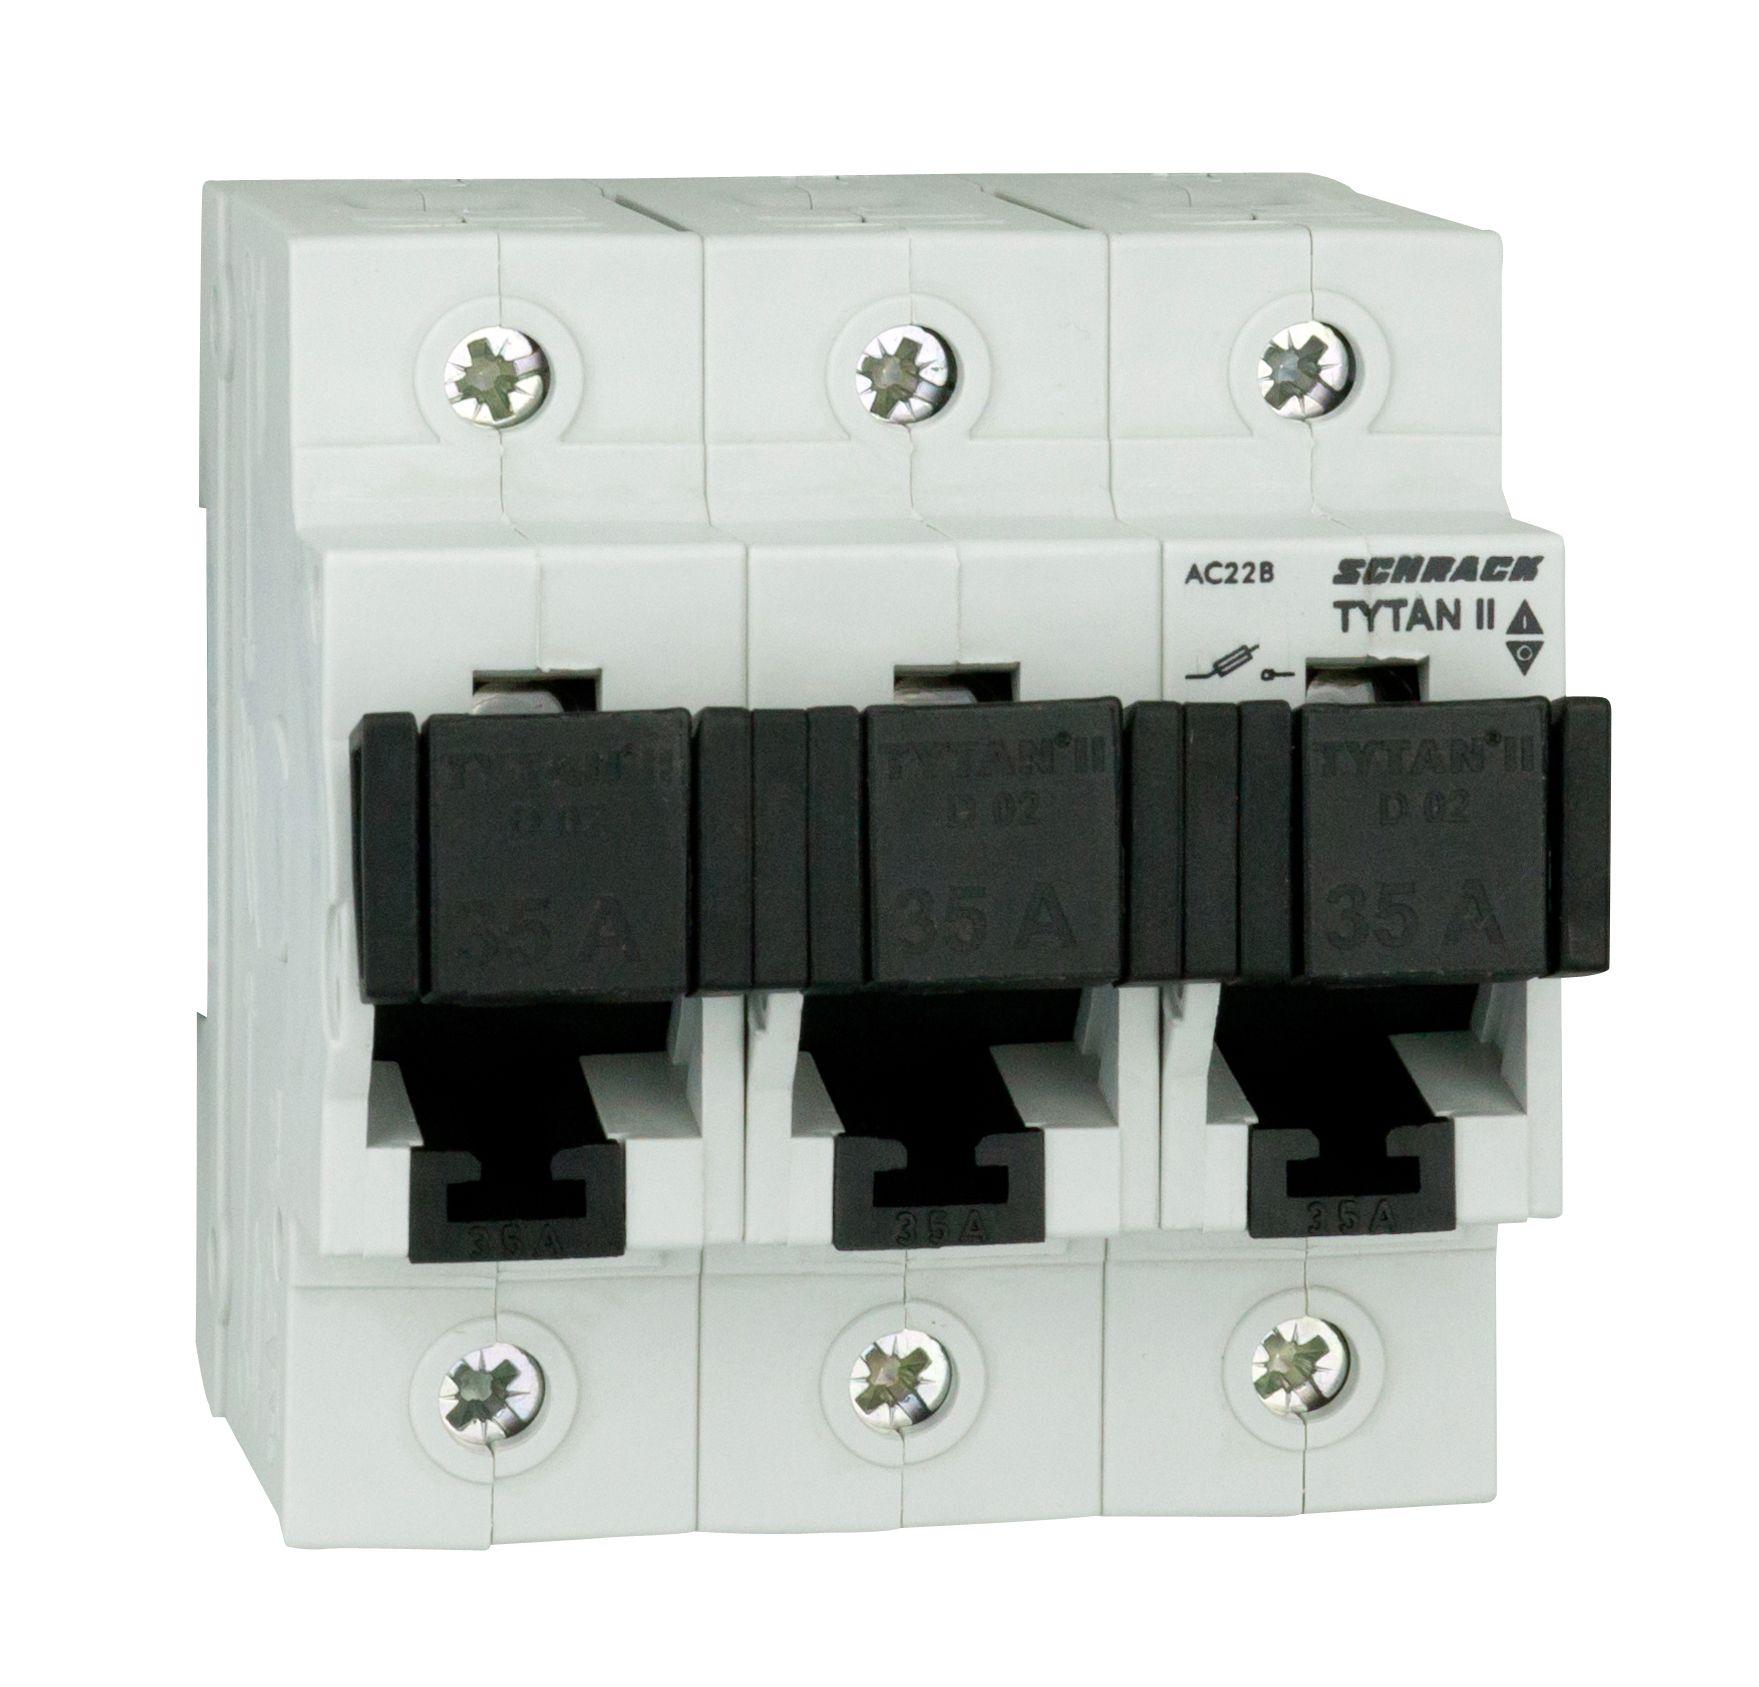 1 Stk TYTAN II, Sicherungslasttrennschalter, 3-polig, kompl., 35A IS509335--